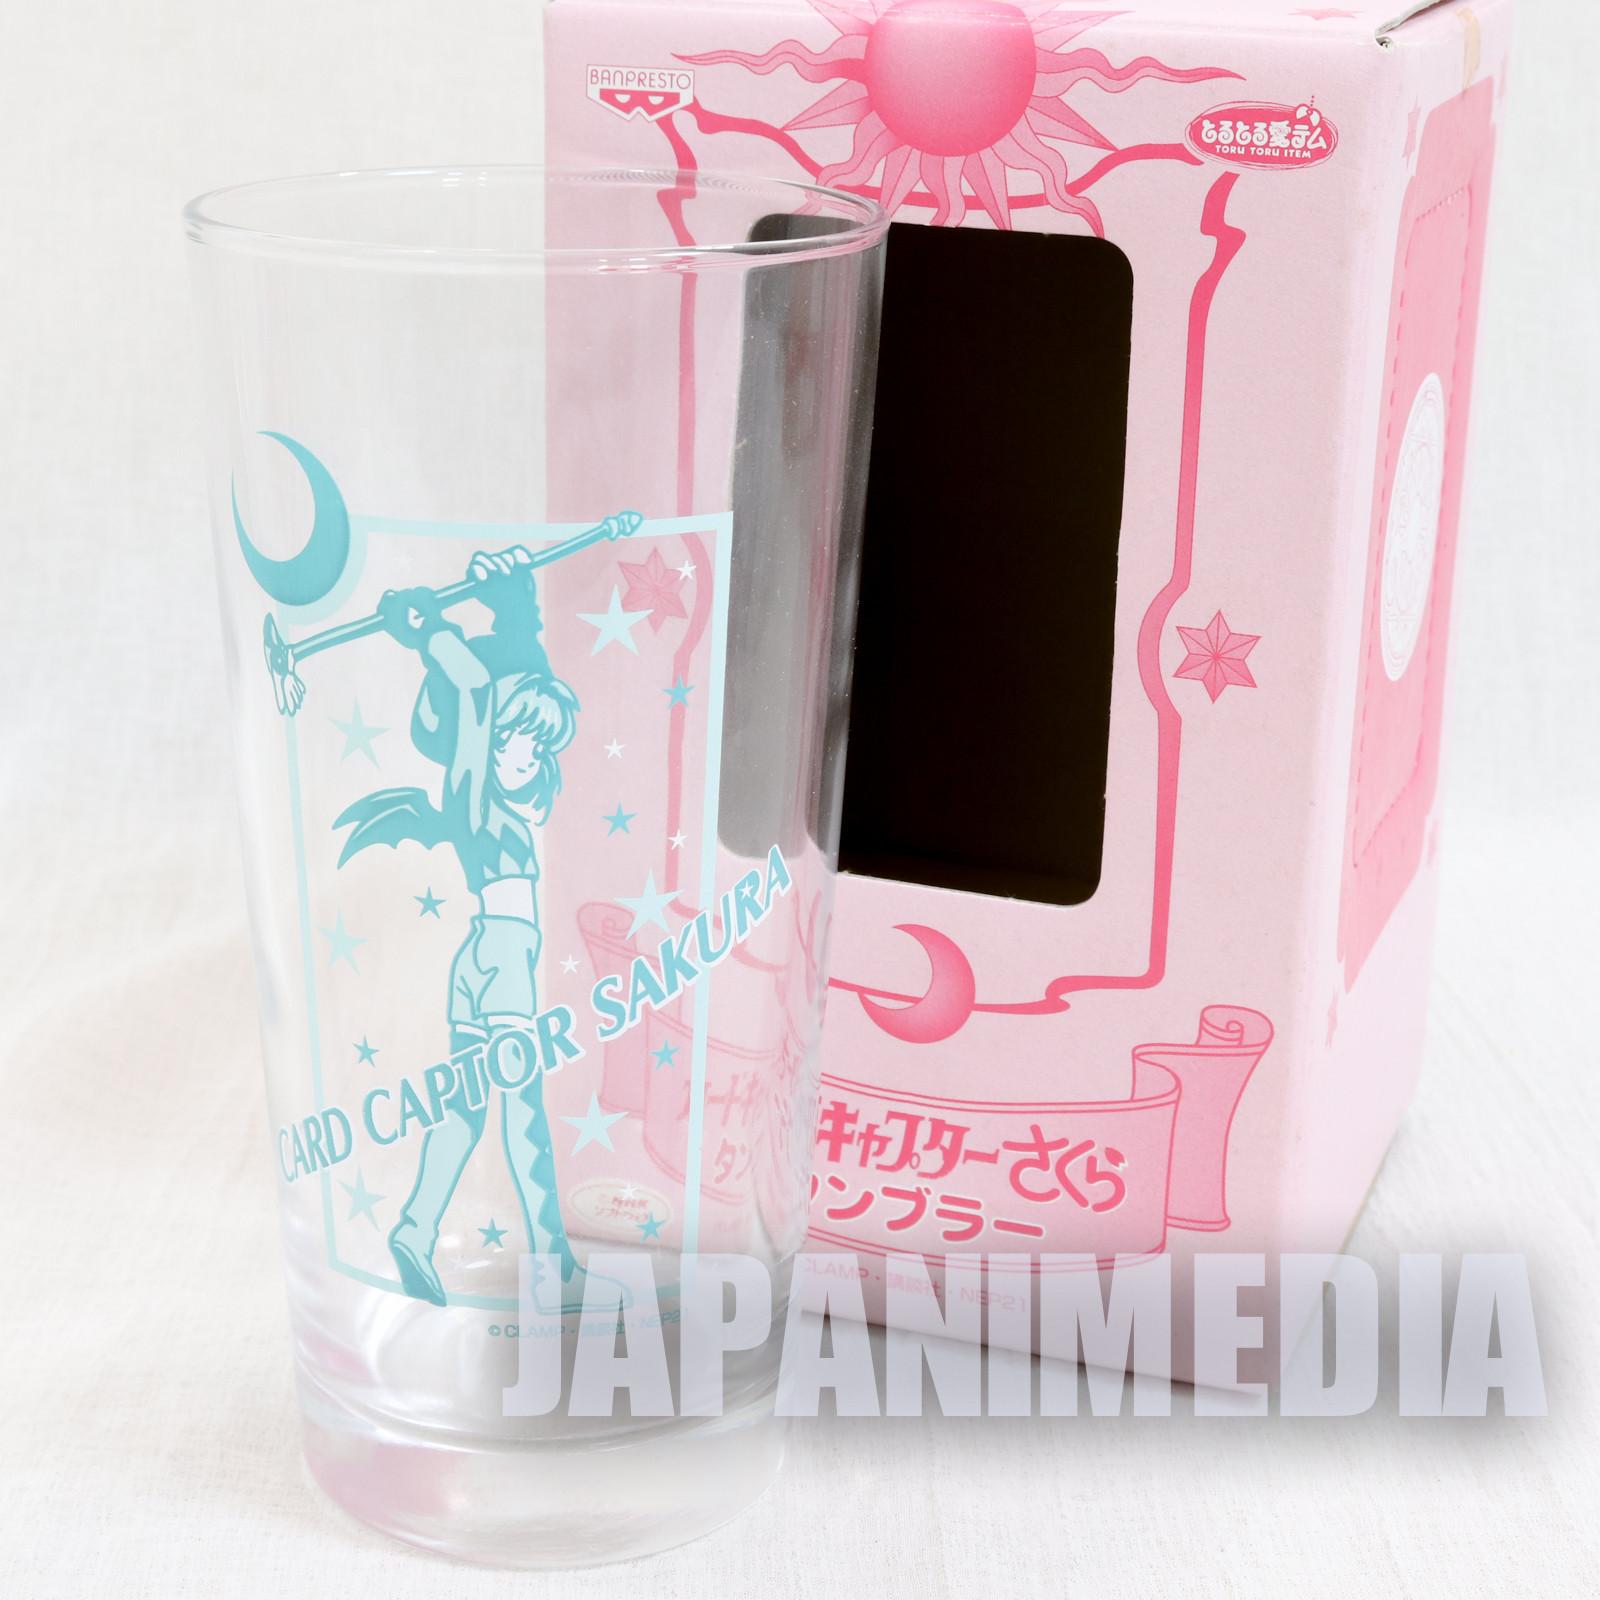 Cardcaptor Sakura Tall Glass Blue Green Banpresto CLAMP JAPAN ANIME MANGA